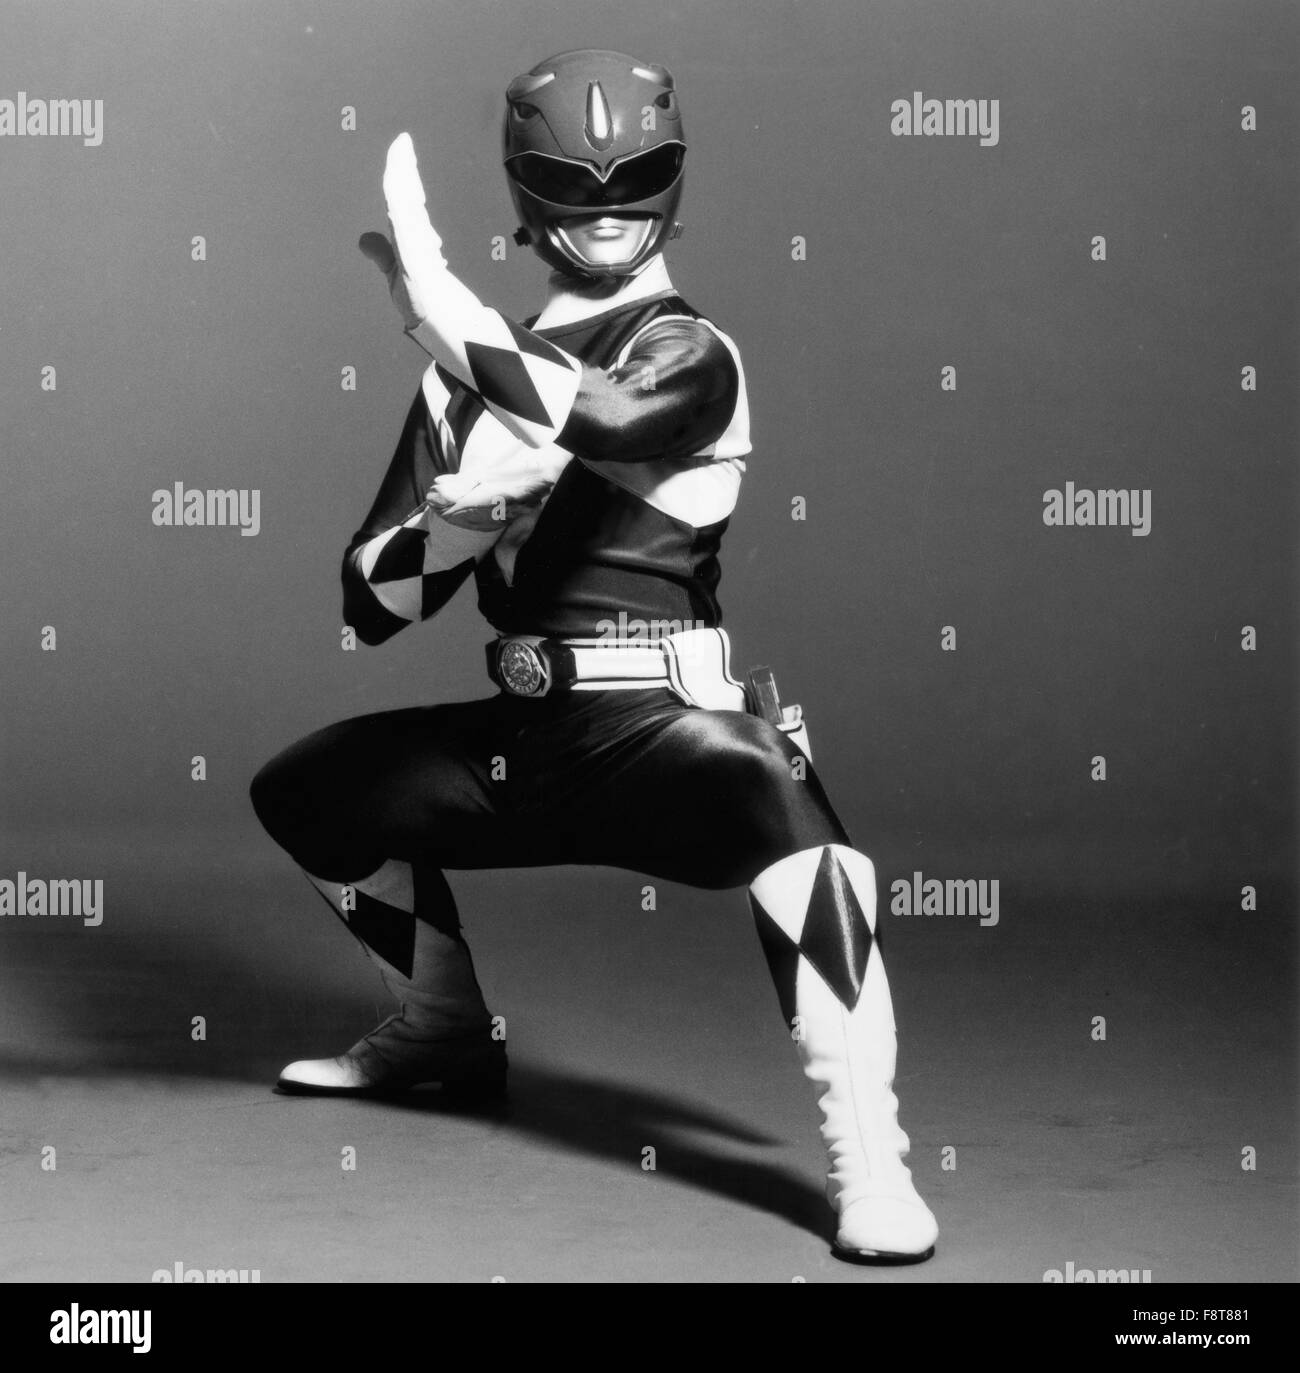 Mighty Morphin Power Rangers, Actionserie, USA 1993-1996, Darsteller: Jason Frank, Steve Cardenas, Karan Ashley, - Stock Image